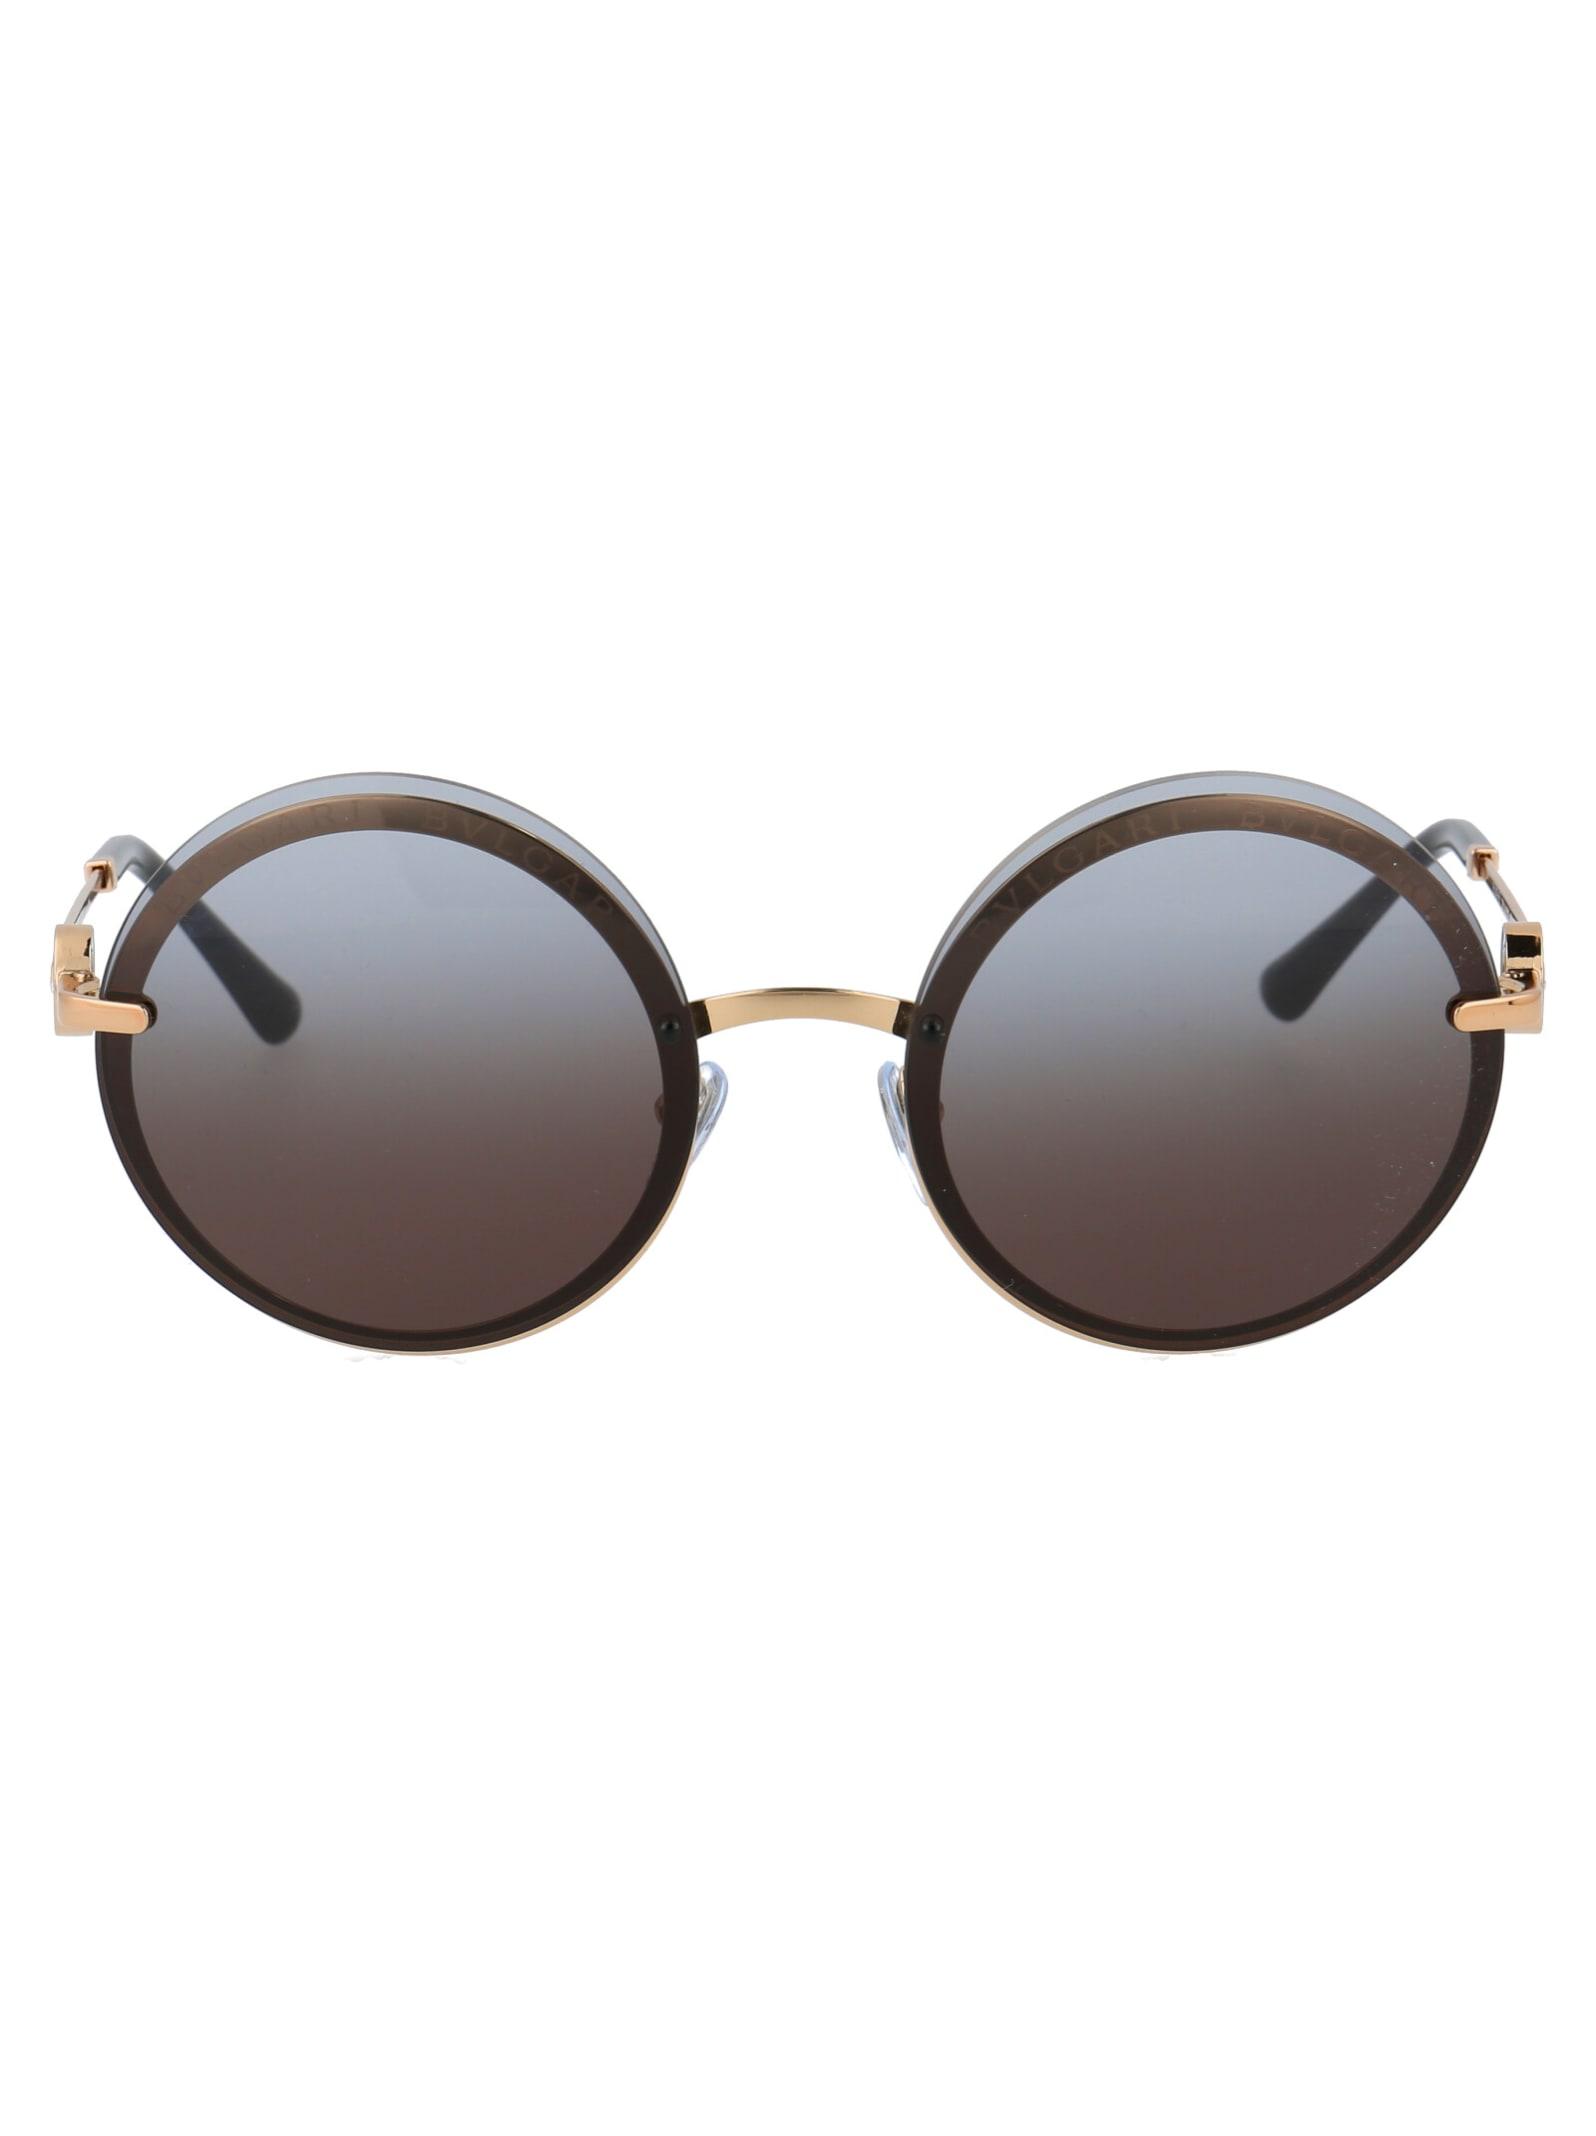 0bv6149b Sunglasses